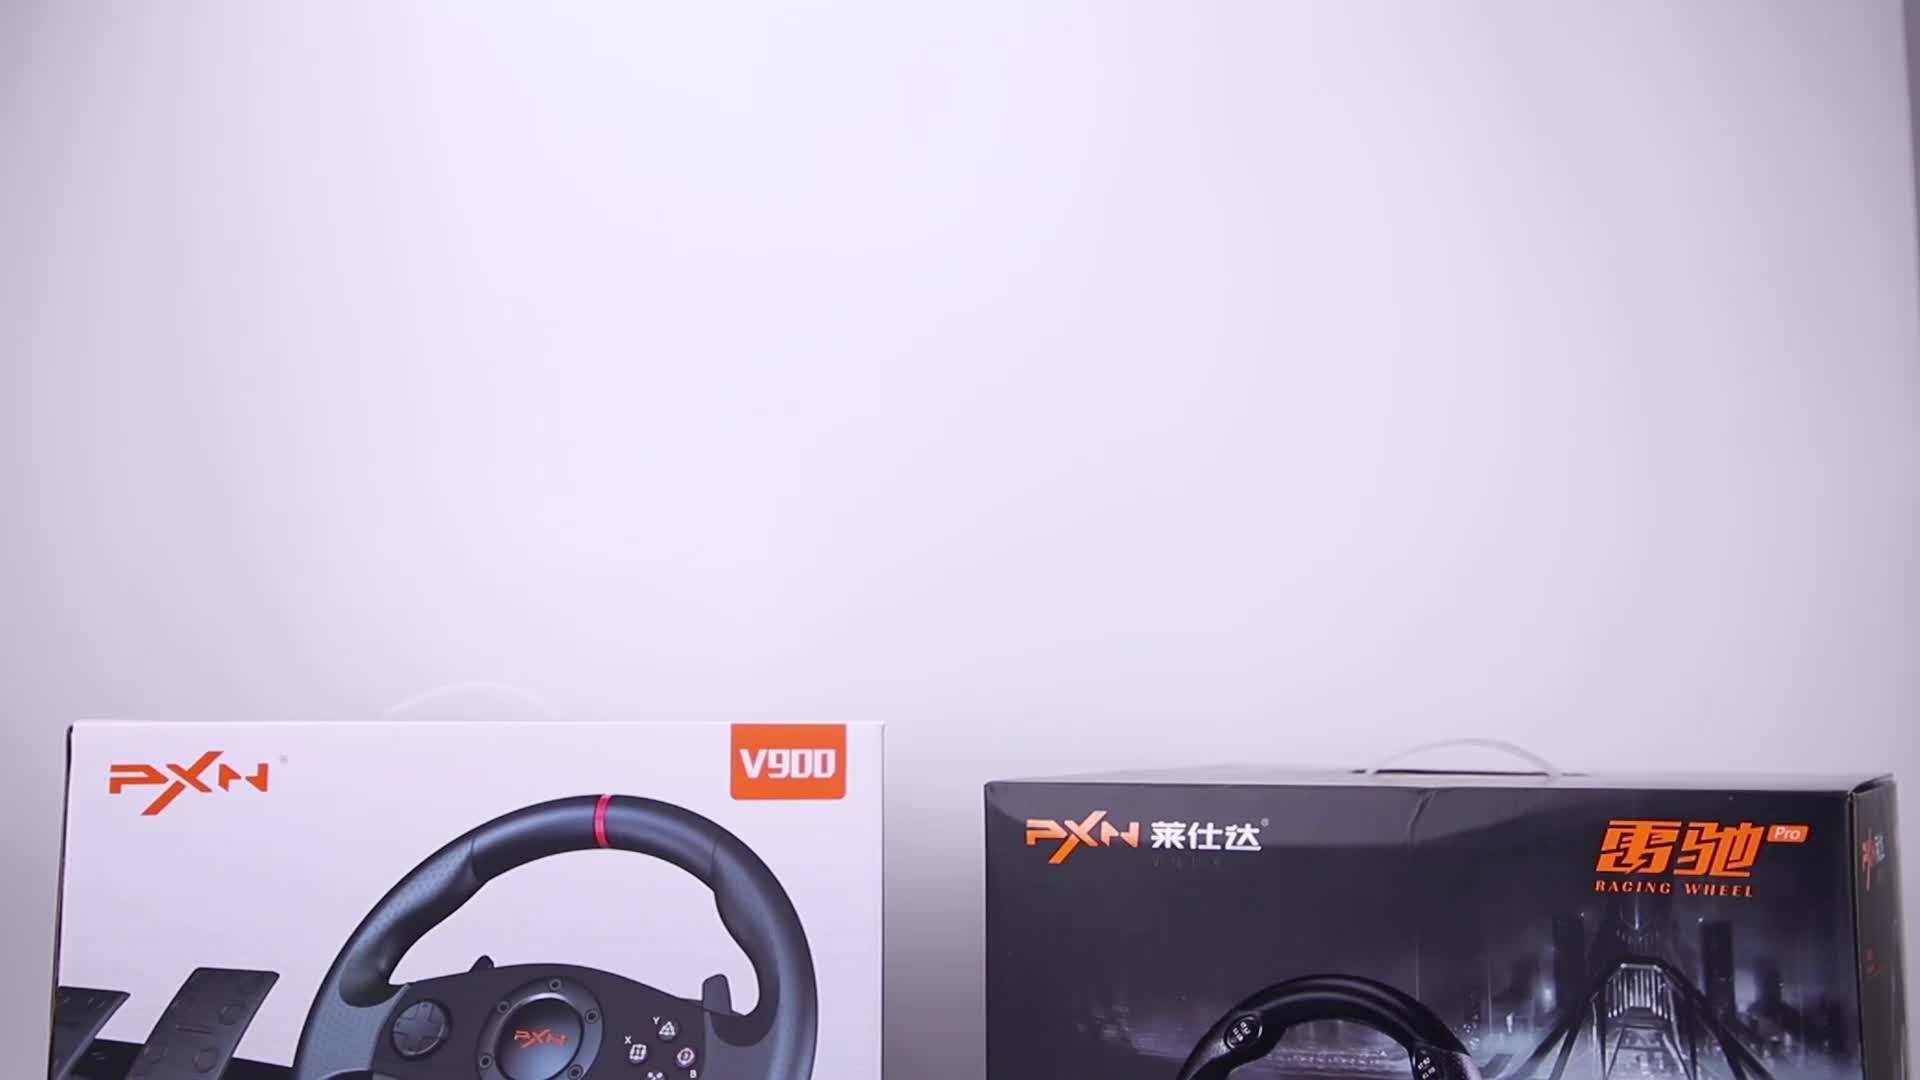 PXN V900 Multi-Platform การสั่นสะเทือนเสียง 900 องศาวิดีโอเกมพวงมาลัยสำหรับ PS3/PS4/XBOX One/PC/SWITCH